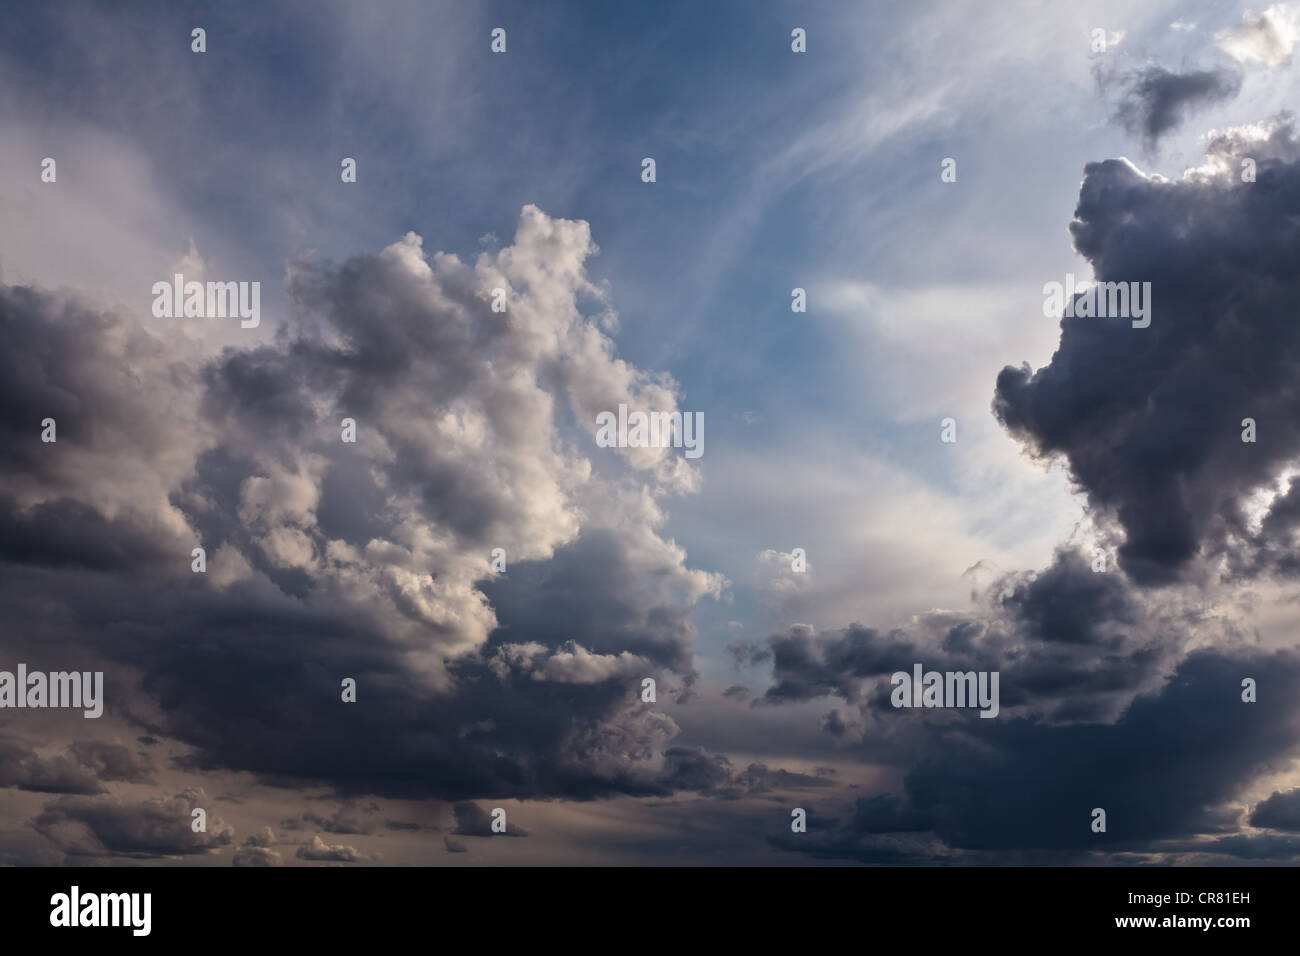 Cumulonimbus clouds. - Stock Image